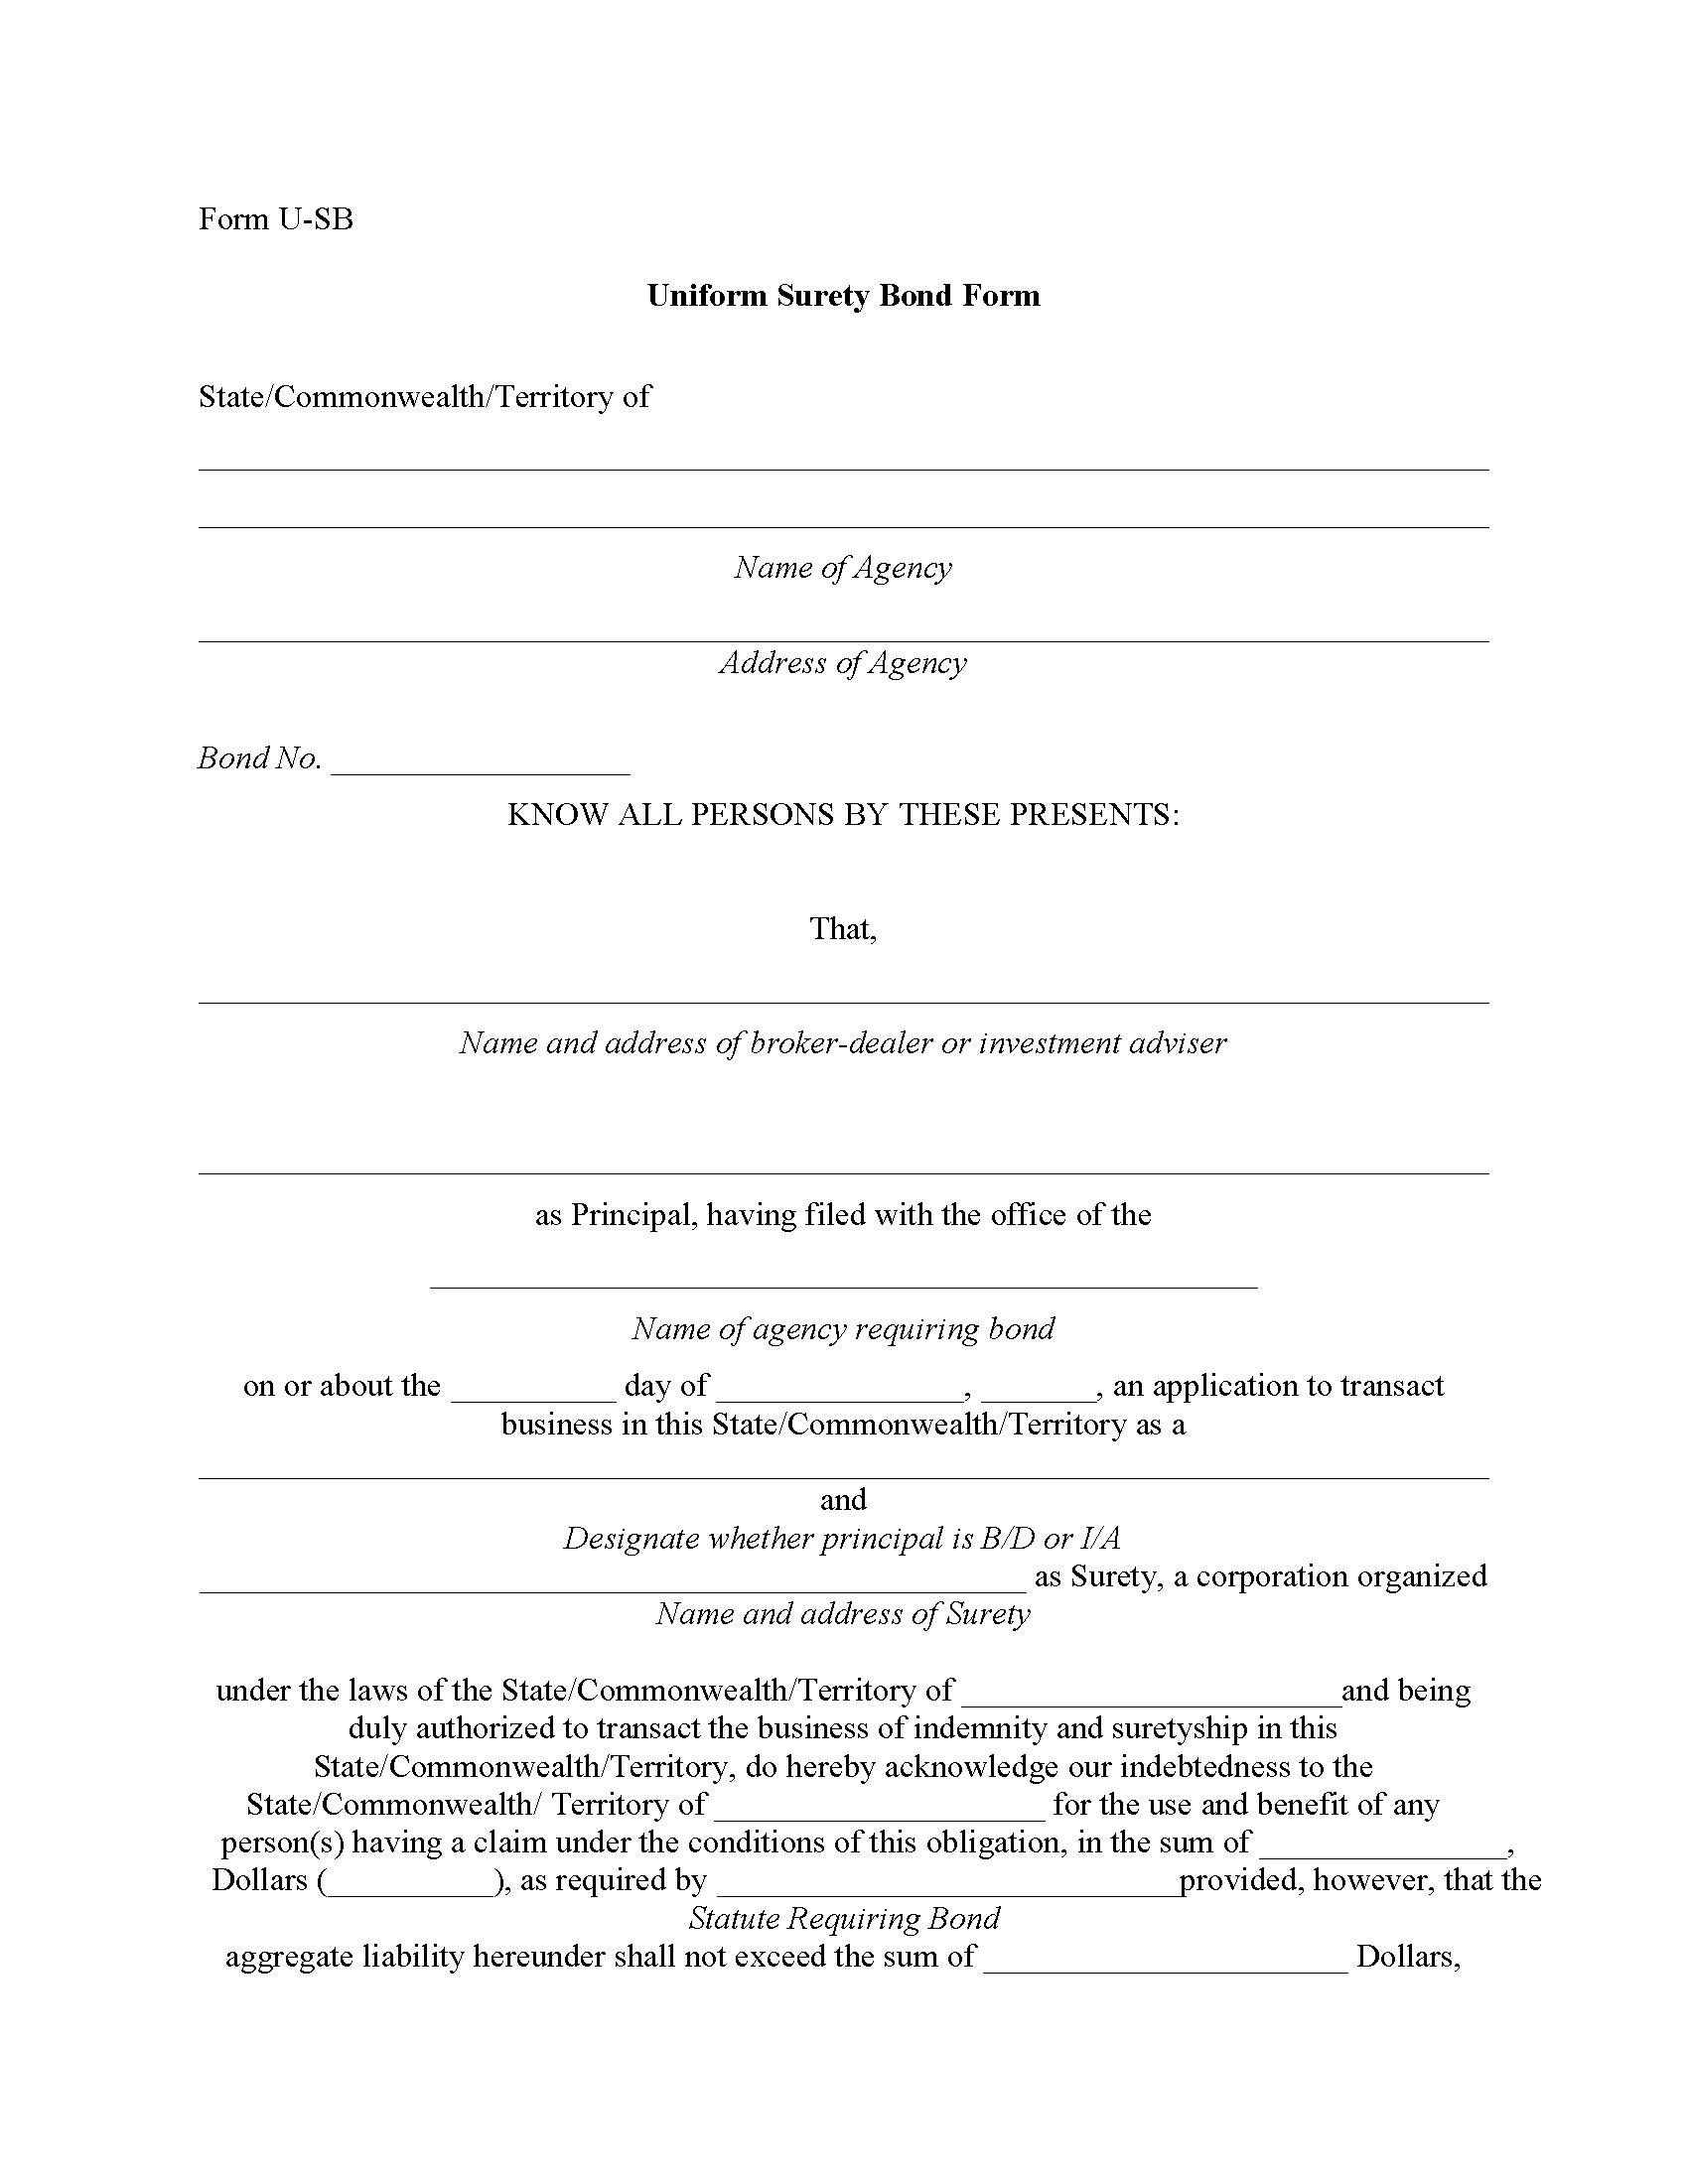 Alabama Securities Commission Investment Advisor sample image